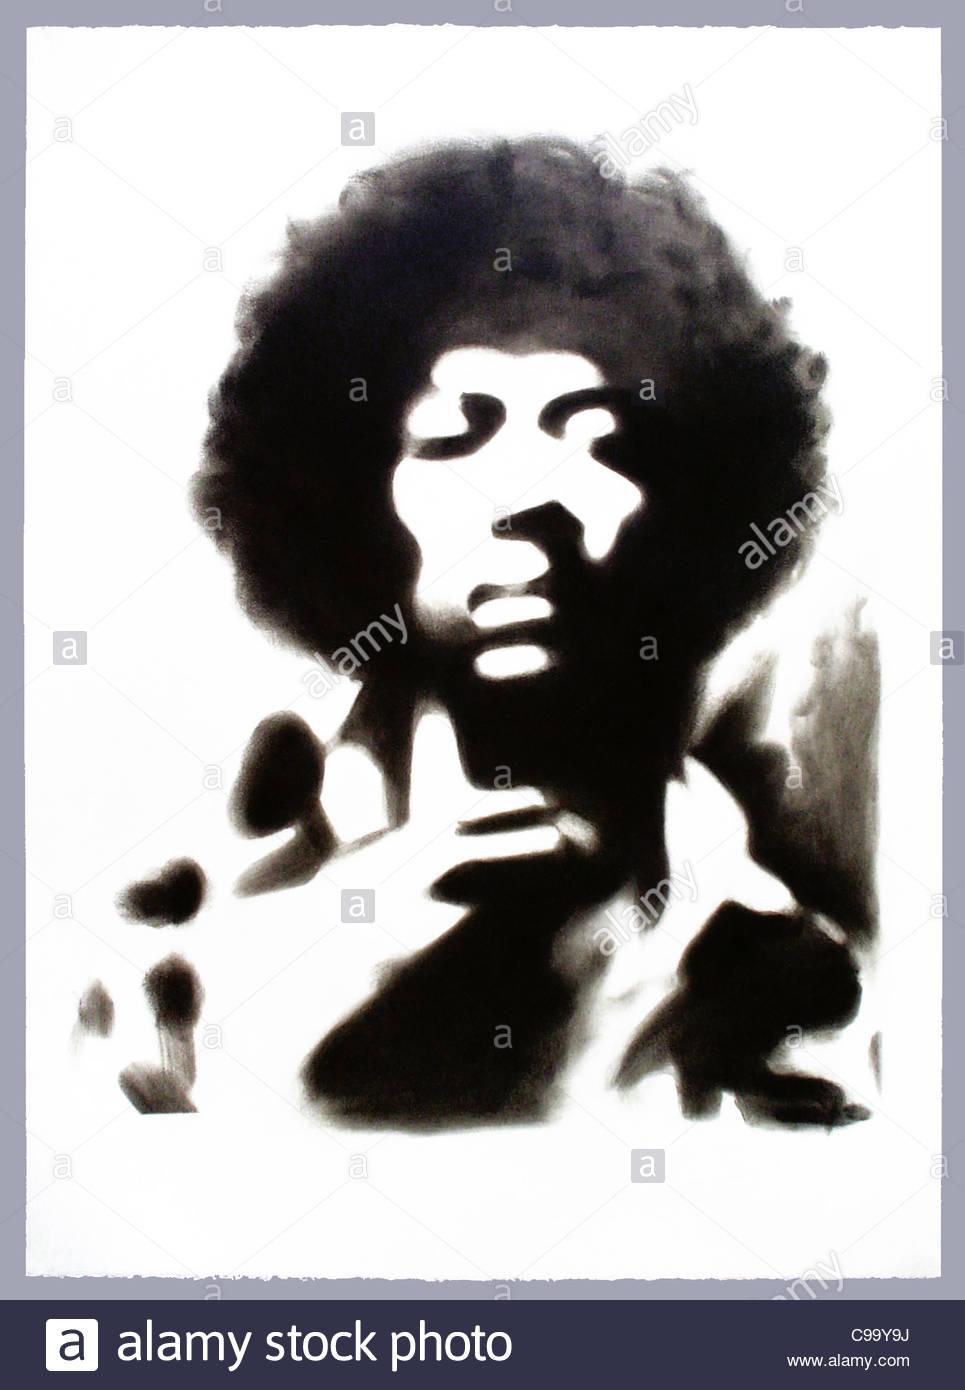 JIMI Hendrix Guitarist Musicians Afro S W Black And White